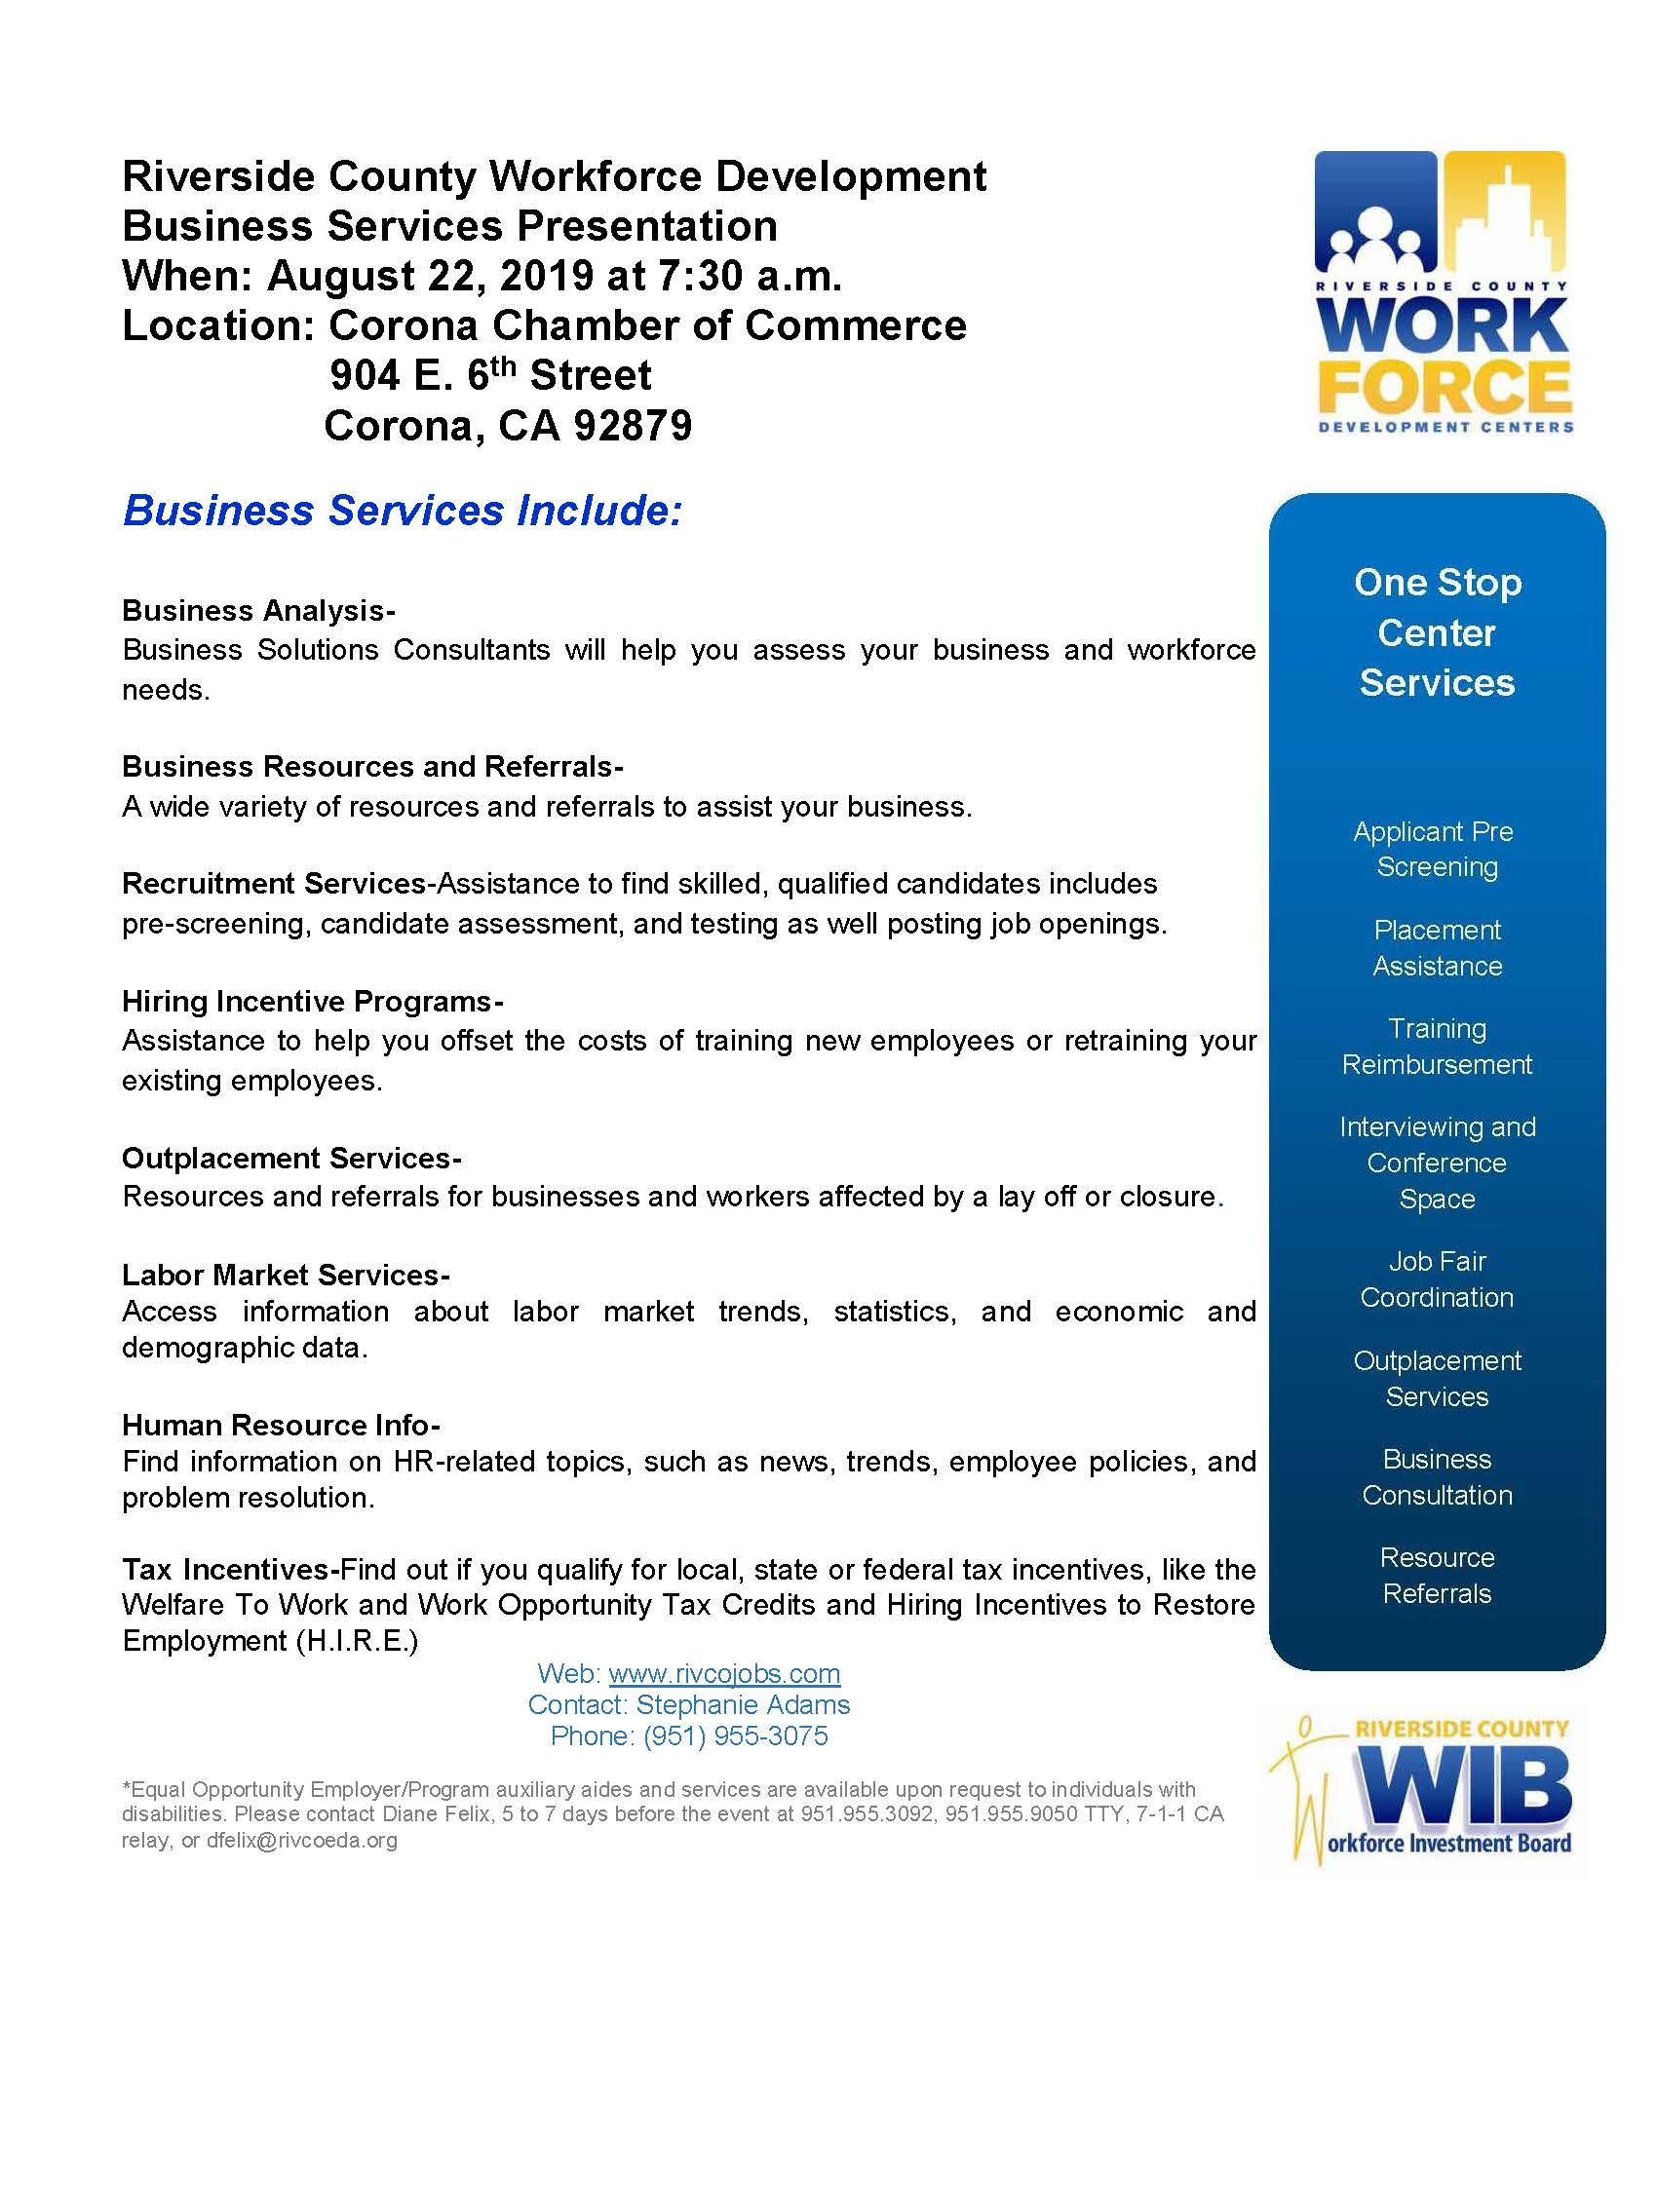 Riverside County Workforce Development Business Services